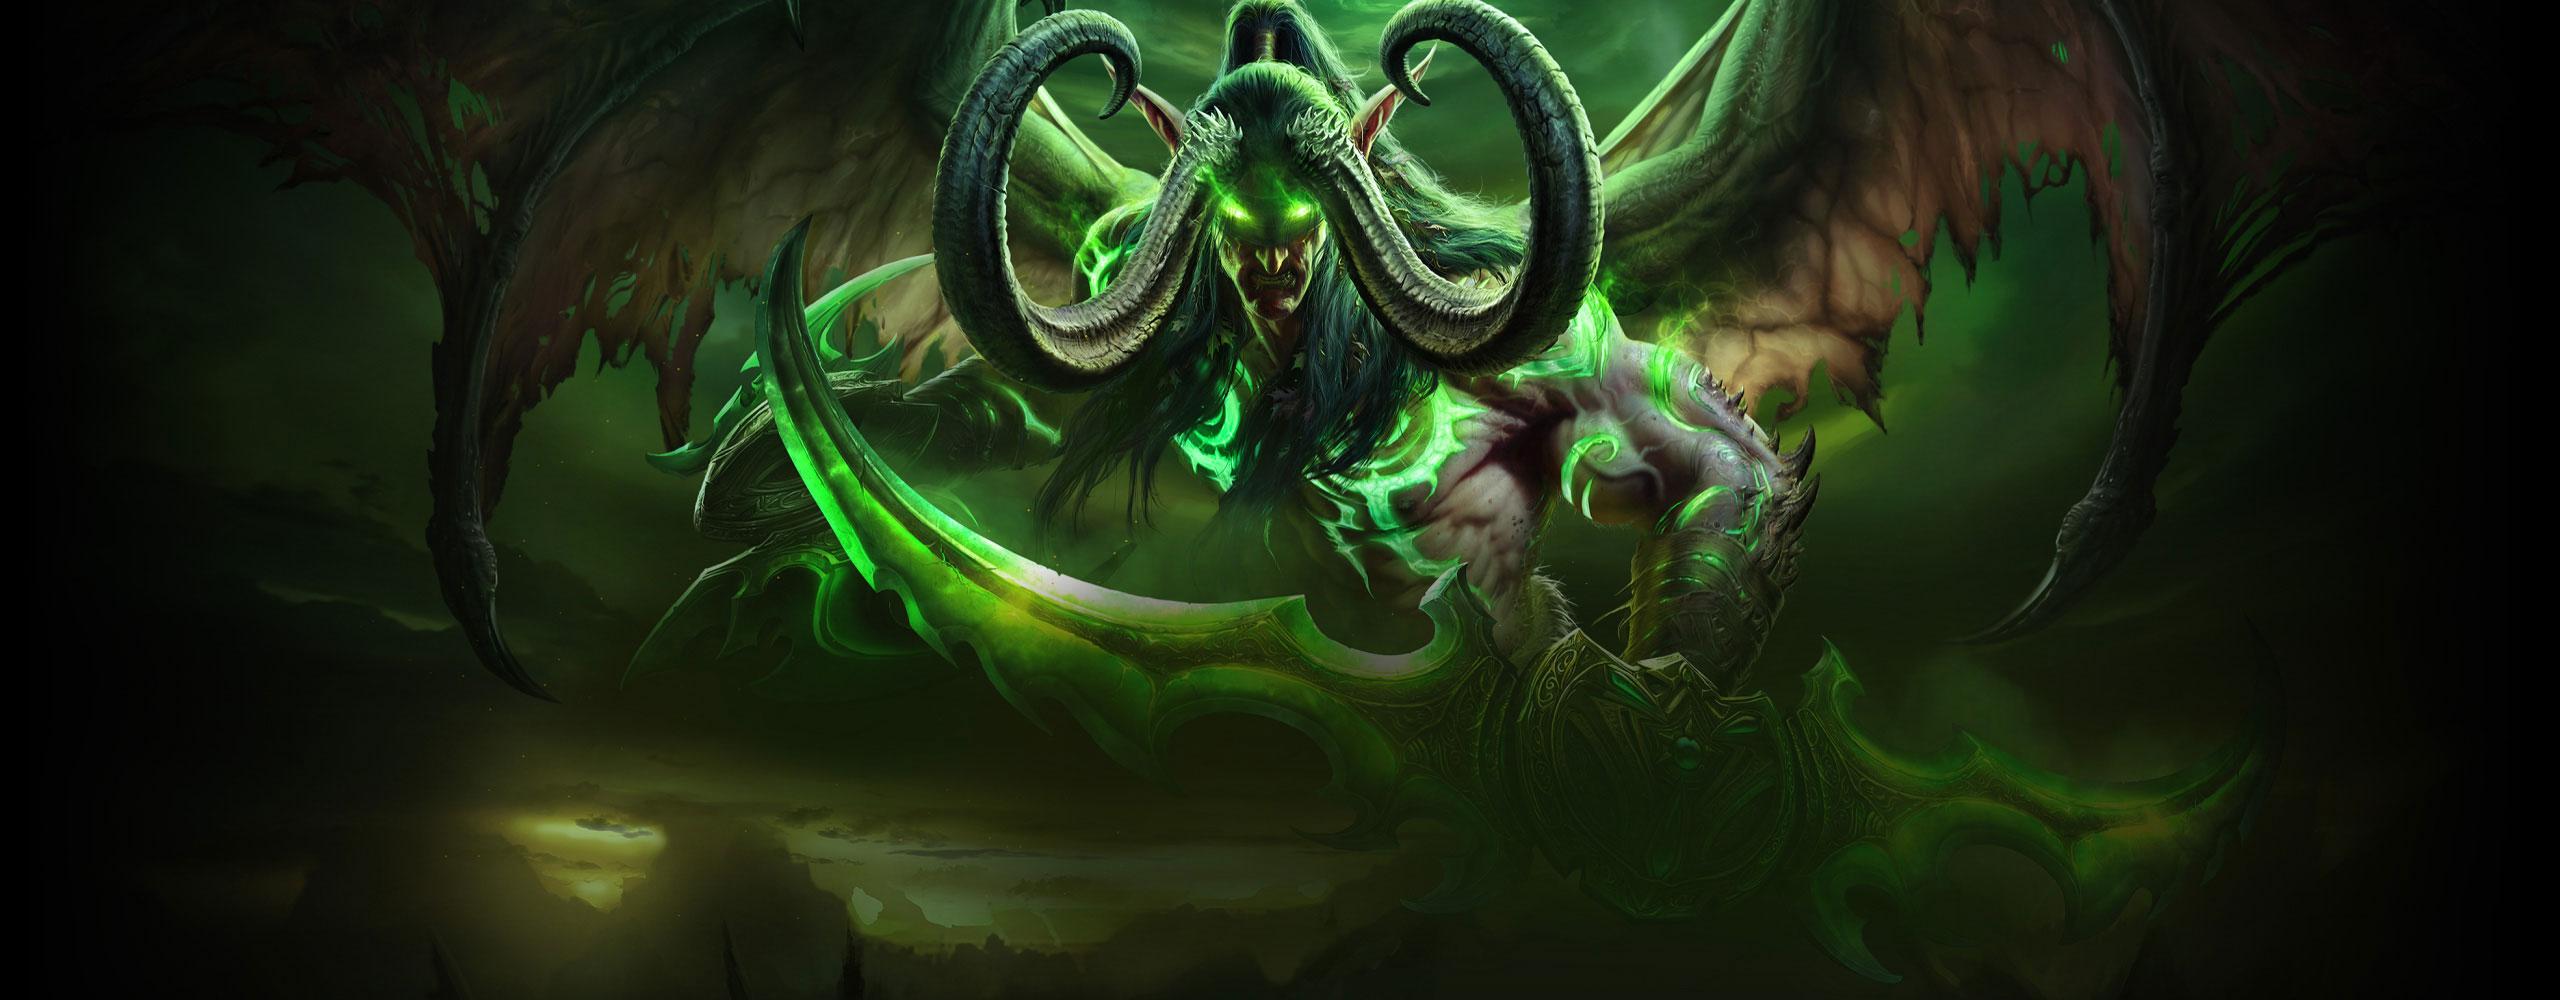 World Of Warcraft Legion Wallpaper 2560x1000